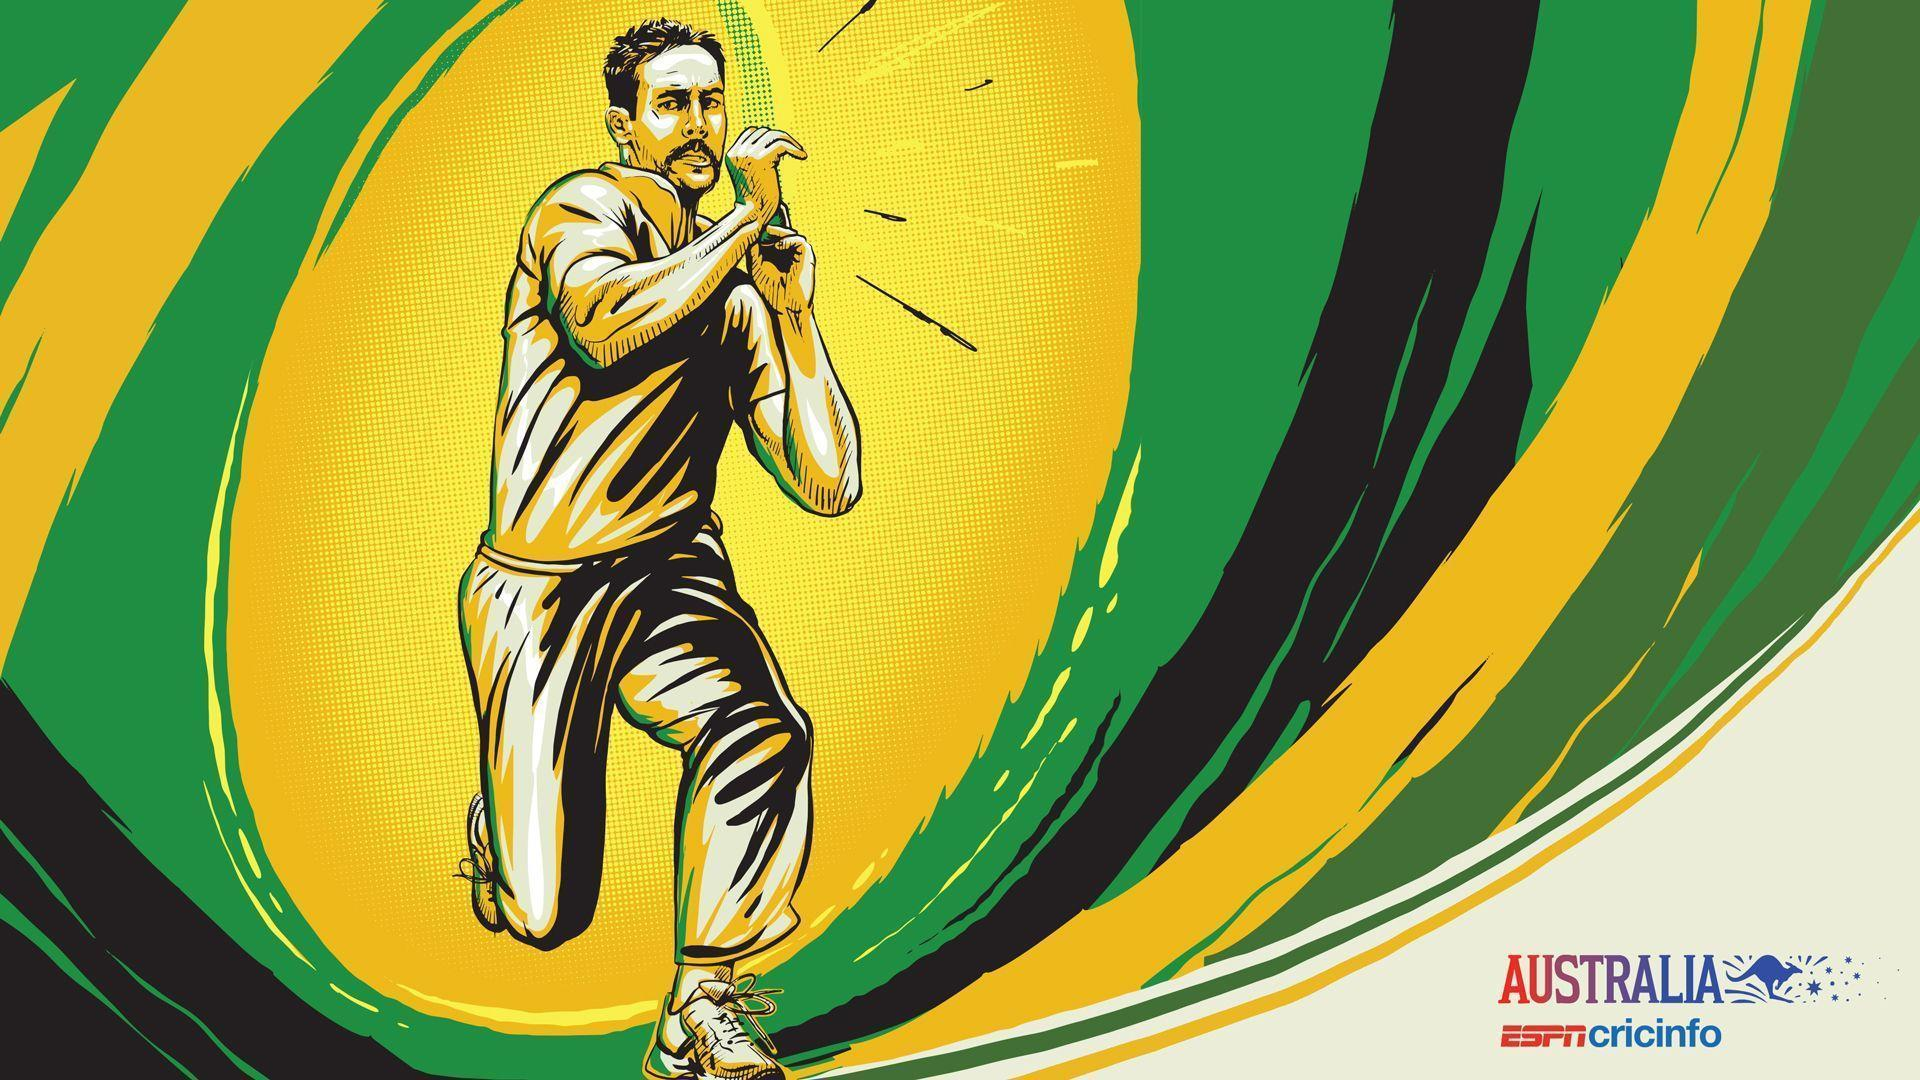 Sports Wallpaper Hd Cricket: Cricket Wallpapers